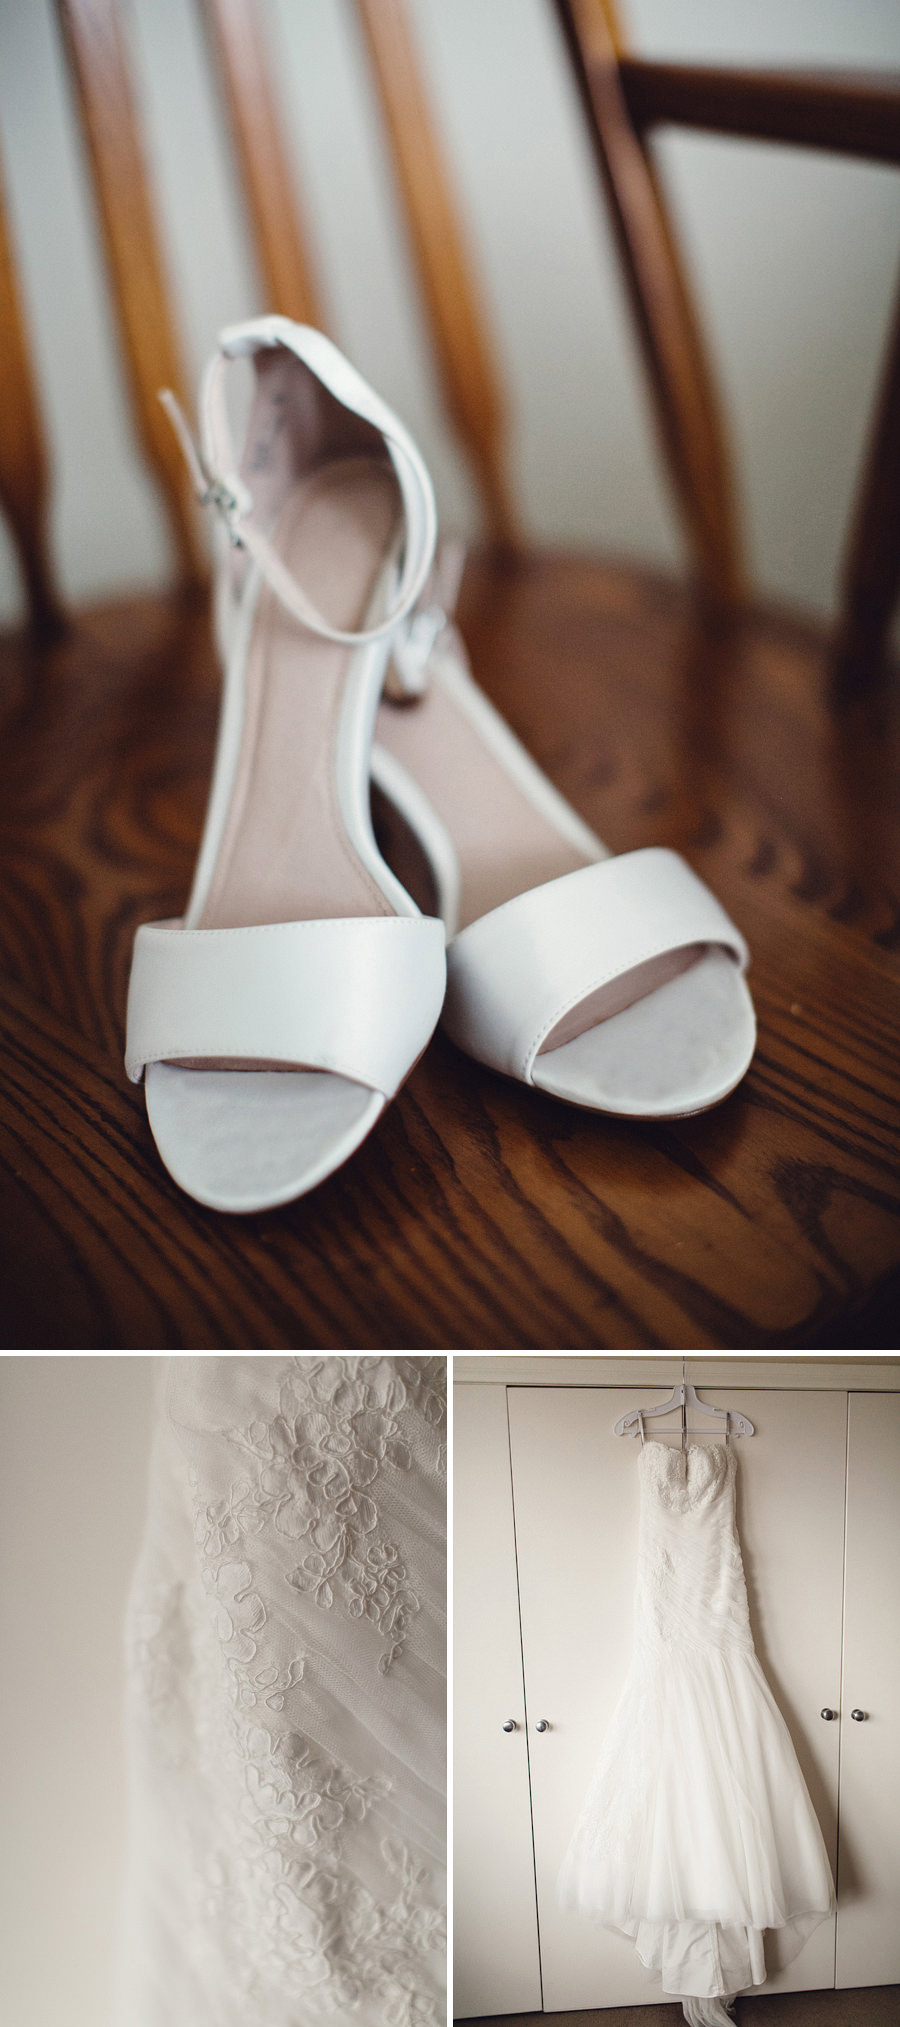 Bondi Junction Wedding Photographers: Bridal details